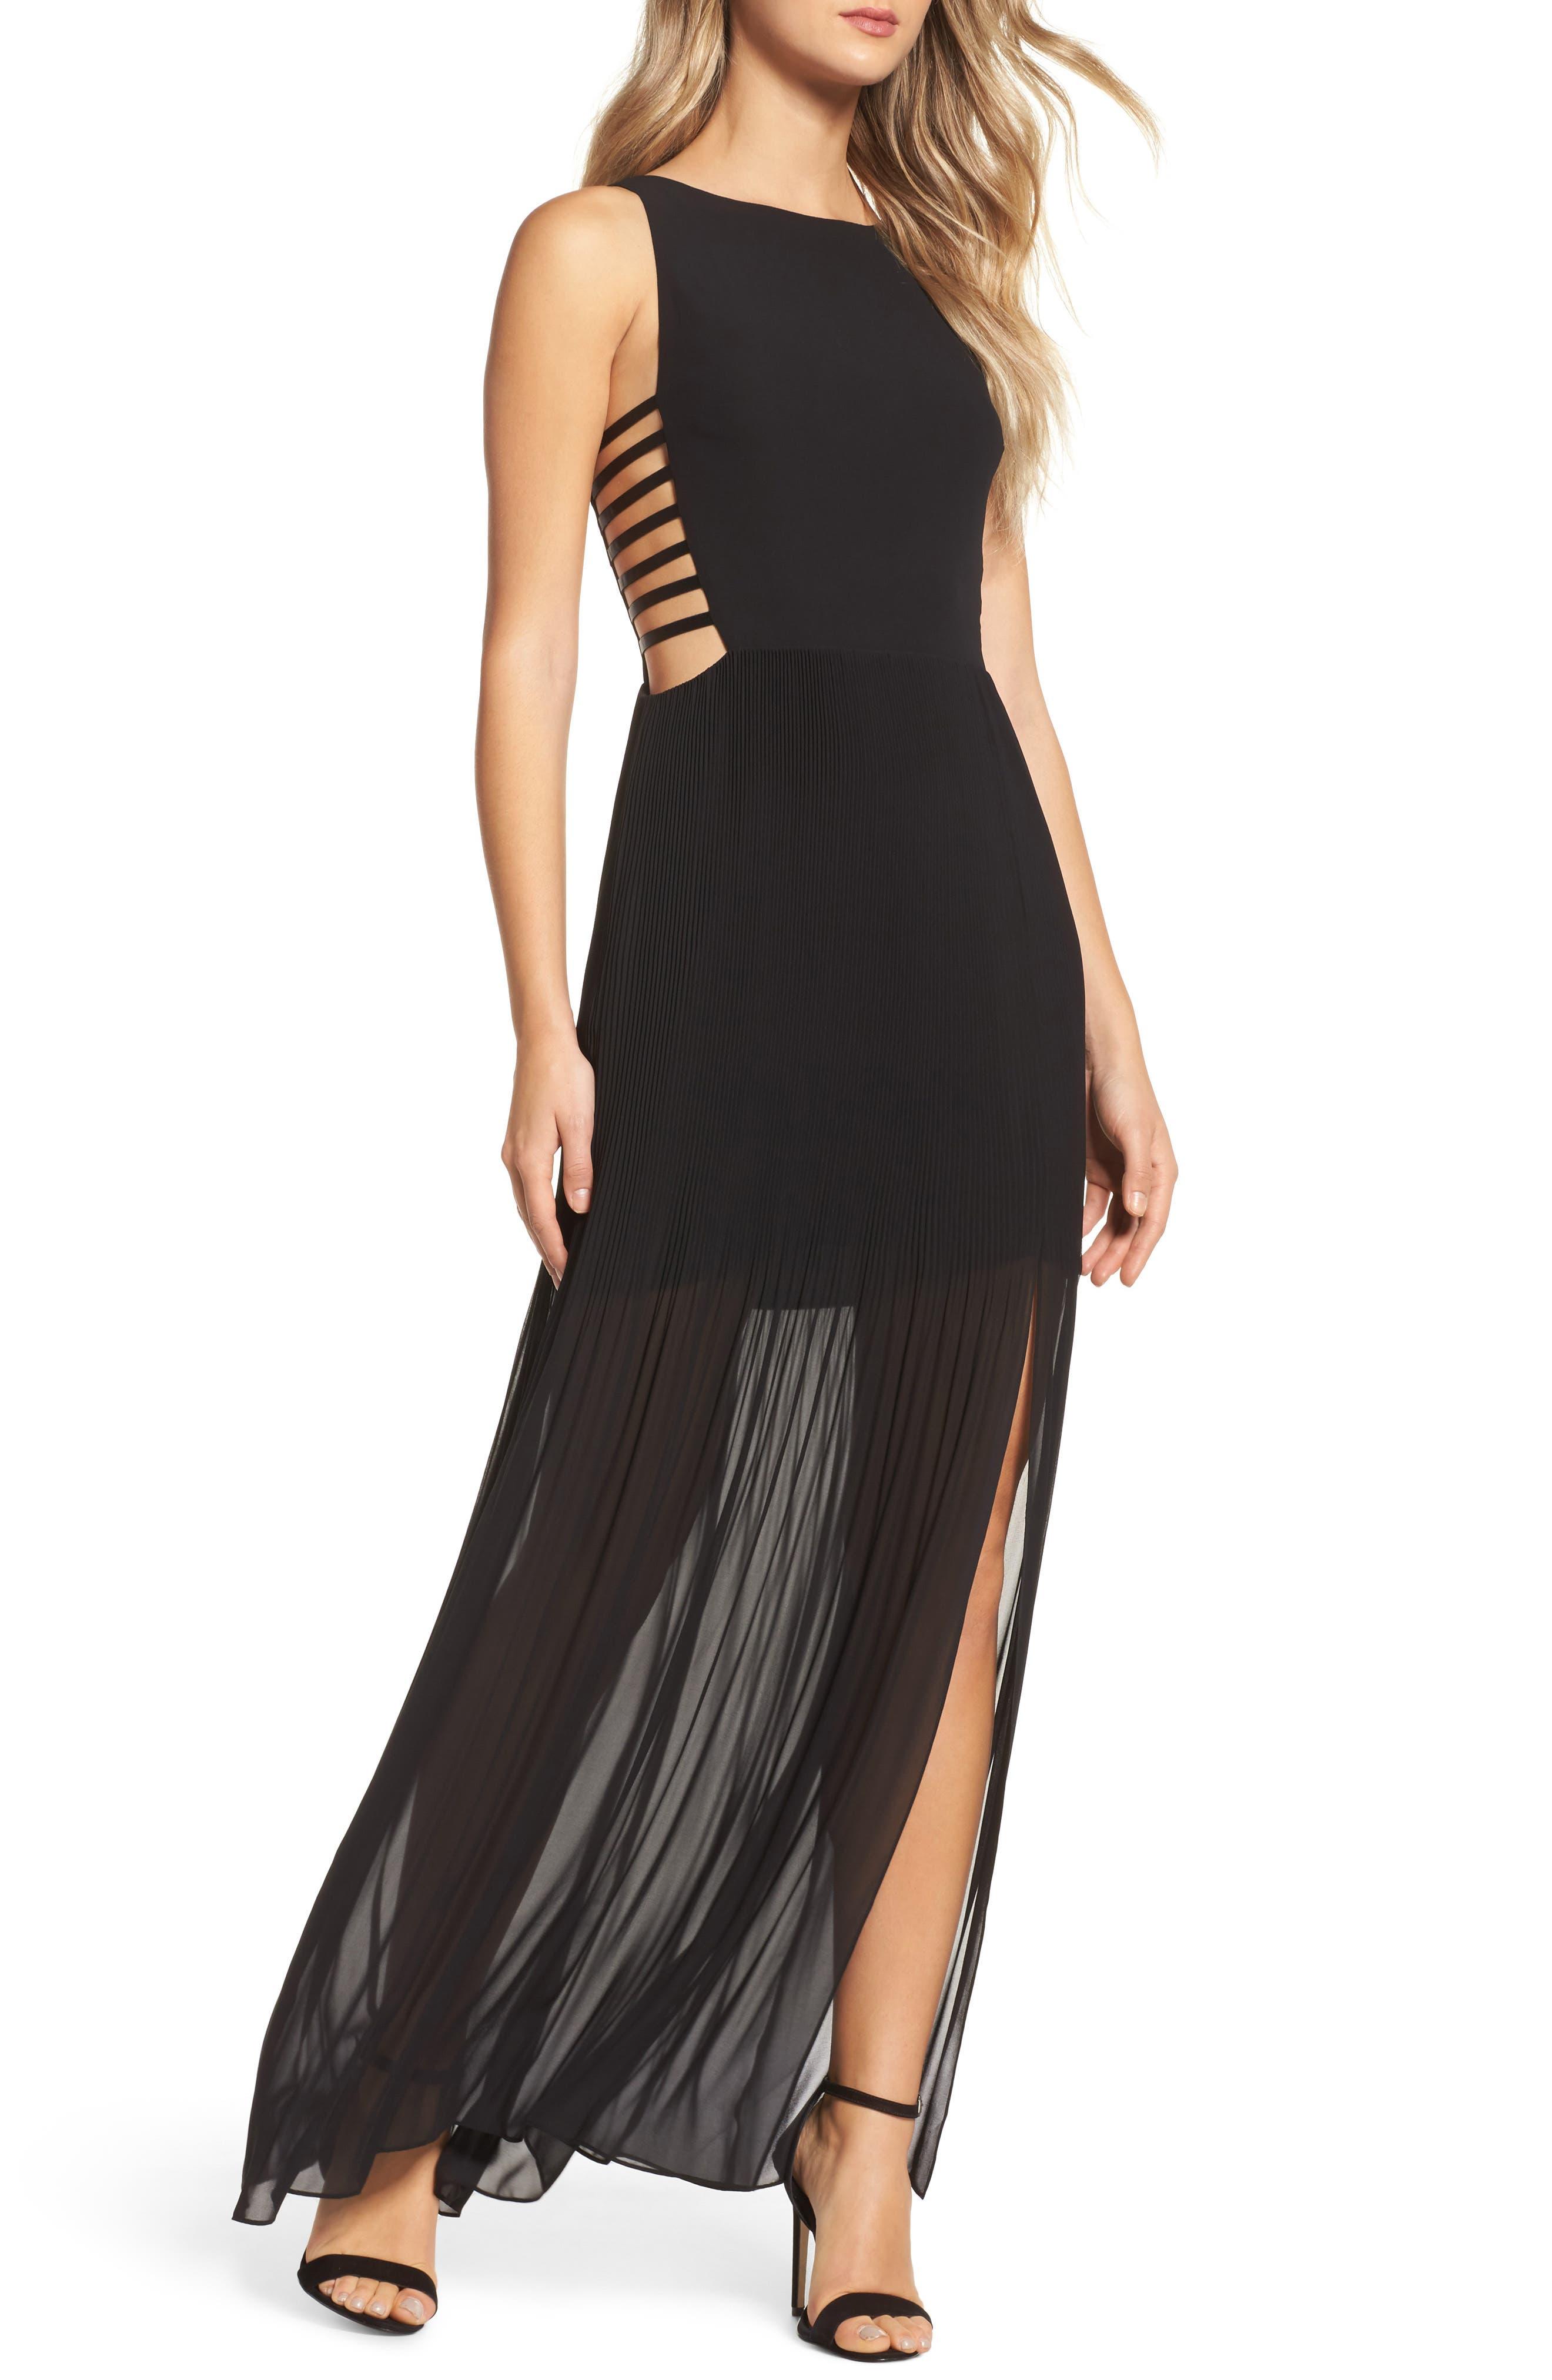 Ali & Jay Sunset Blvd Maxi Dress